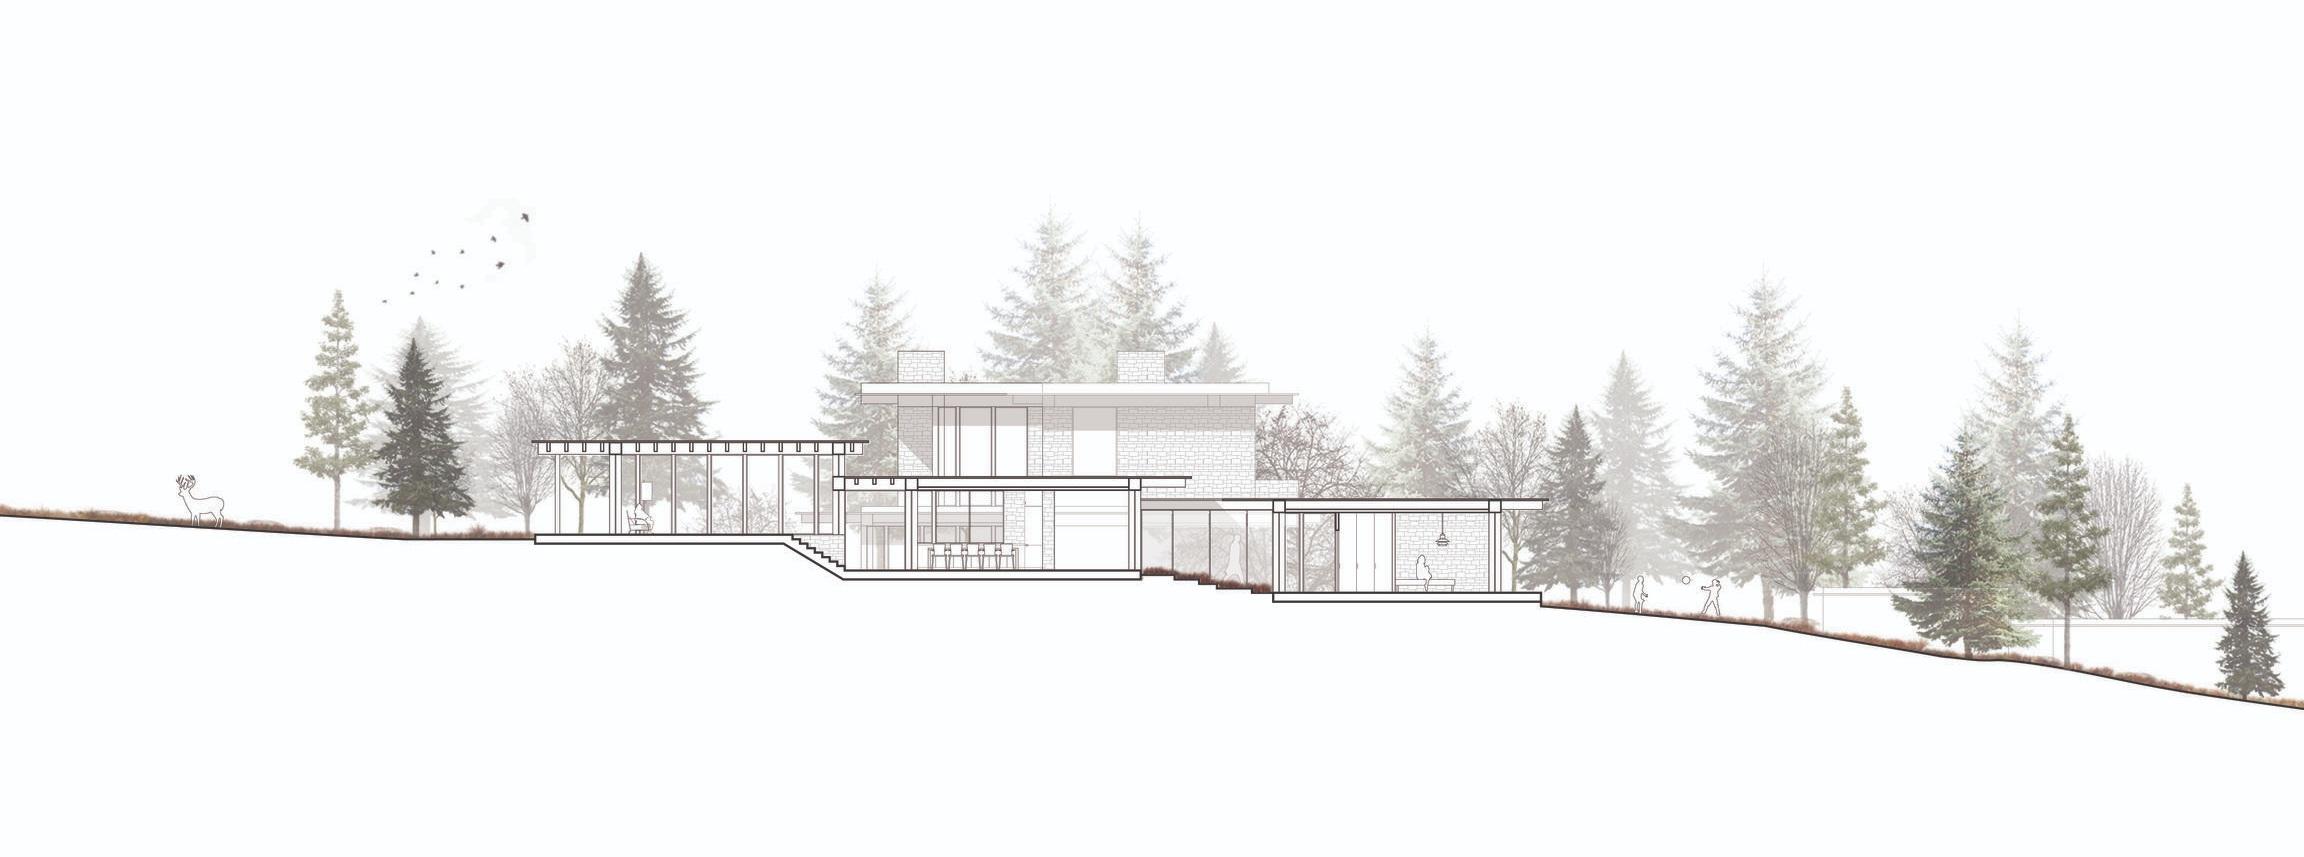 18-02-2019_Steping_House_AGA-01.jpg